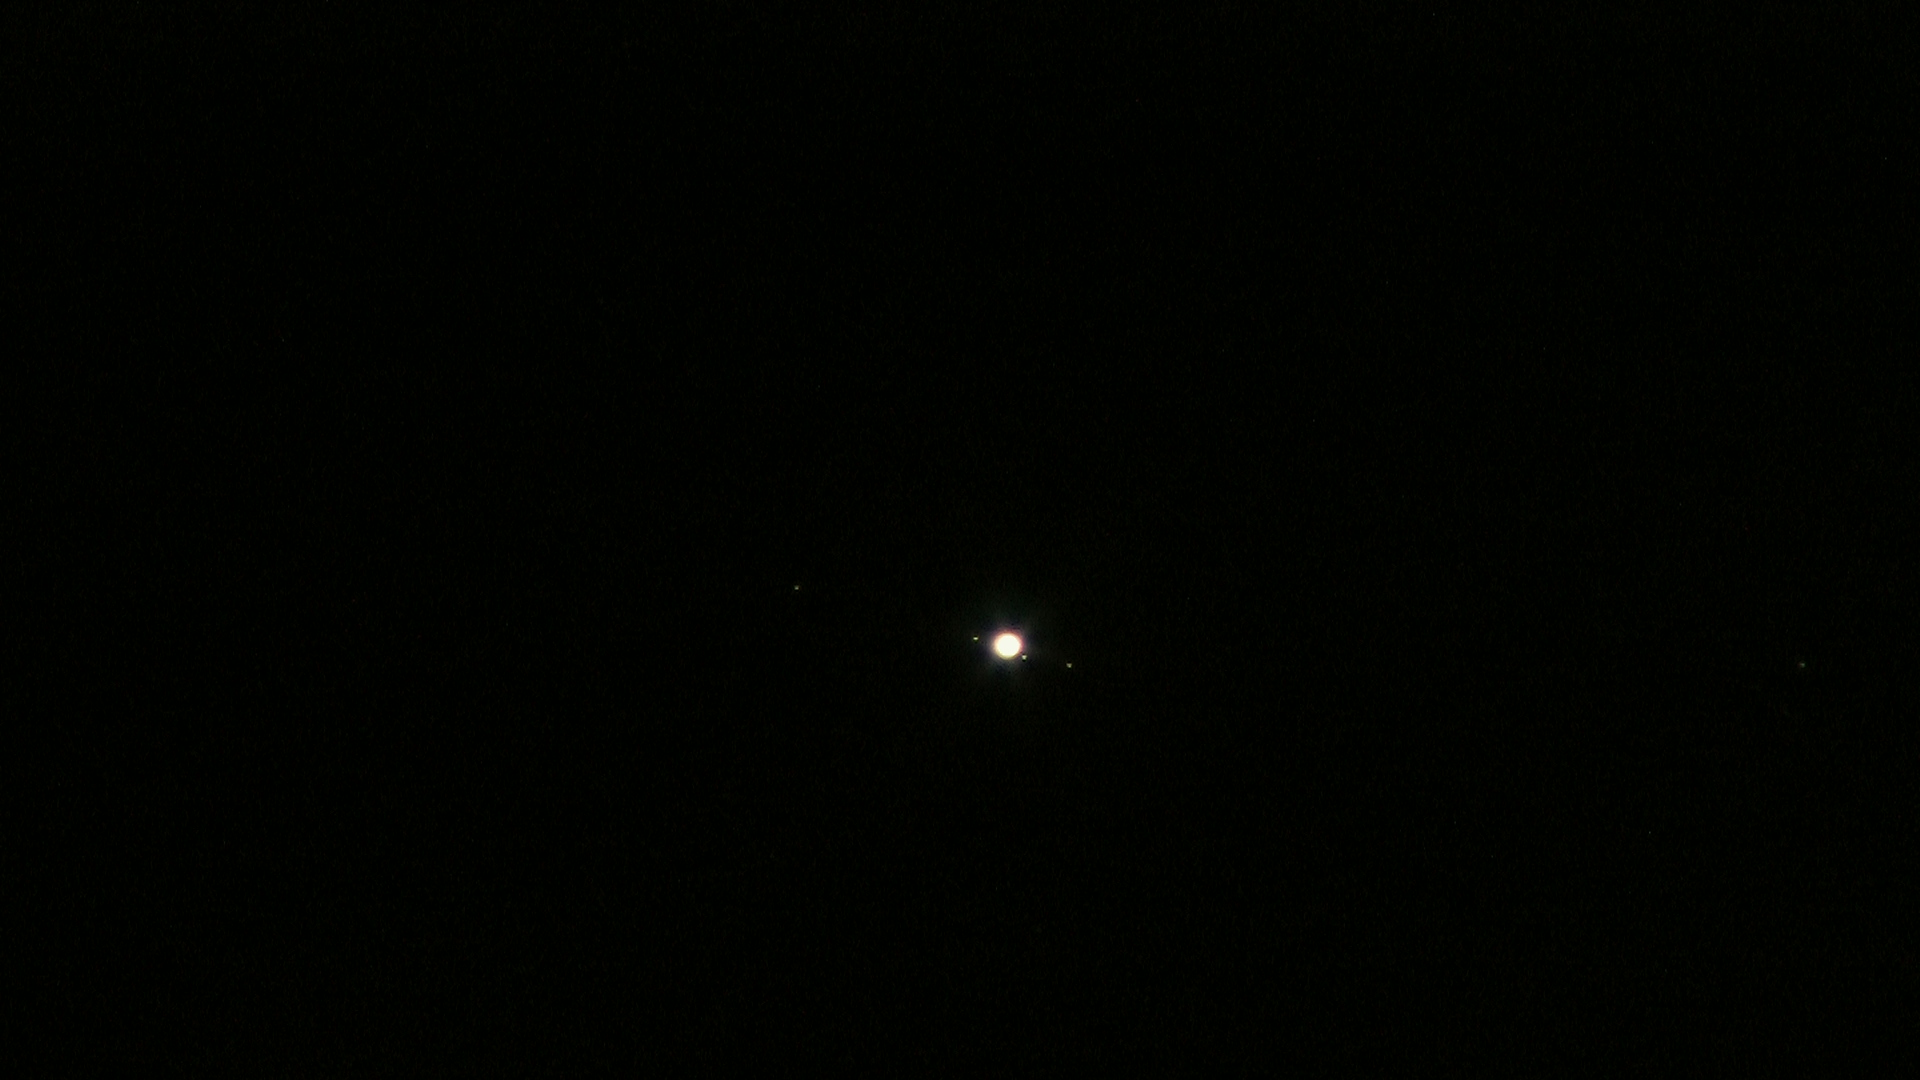 pandora moon of jupiter - photo #31